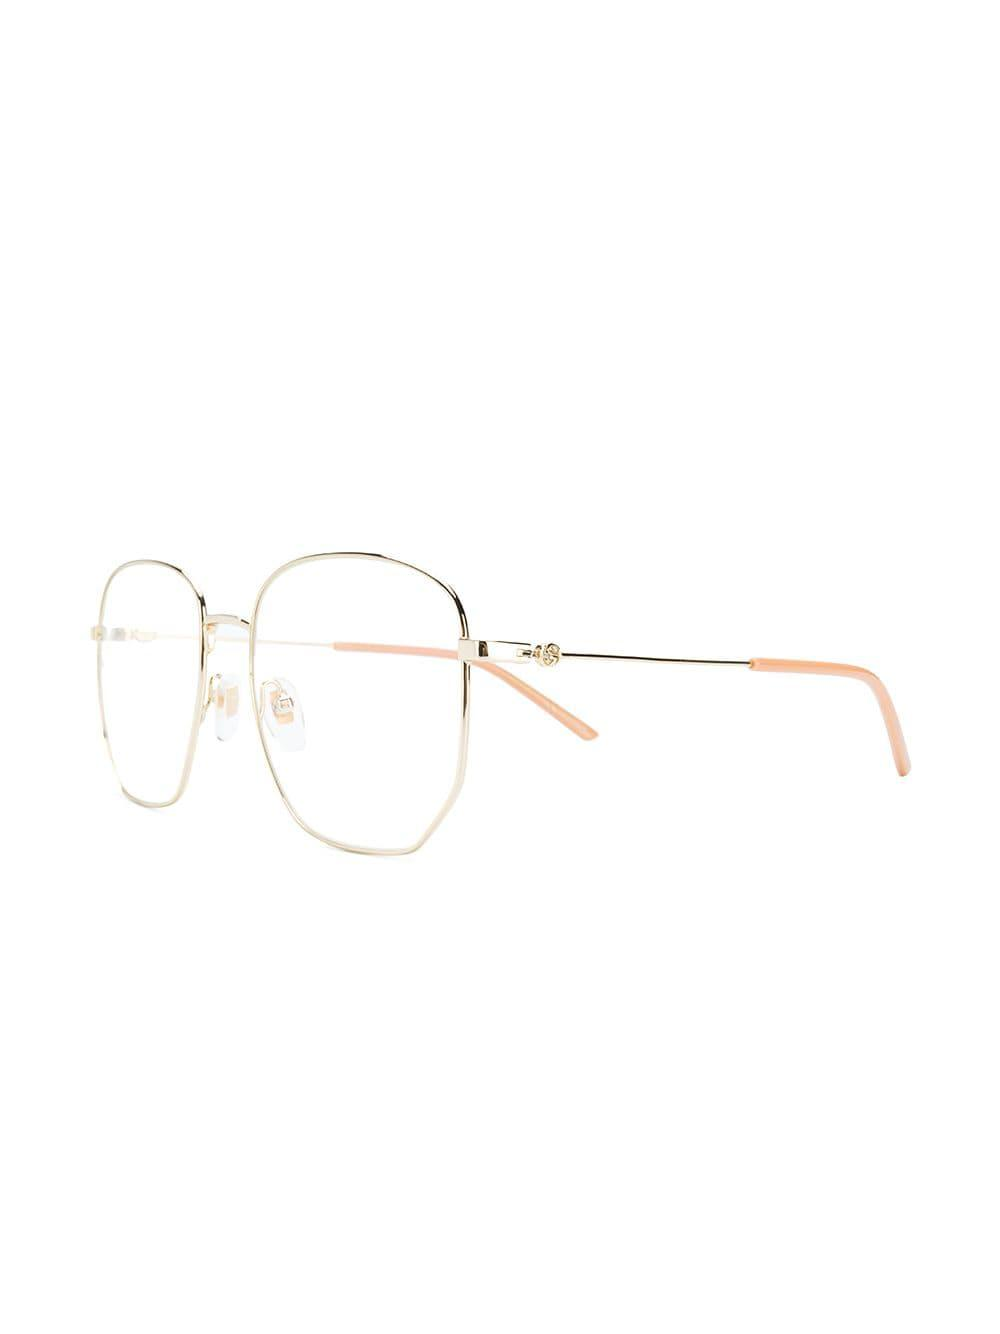 7f64dbf80499d Gucci Rectangular Frame Glasses in Metallic - Lyst